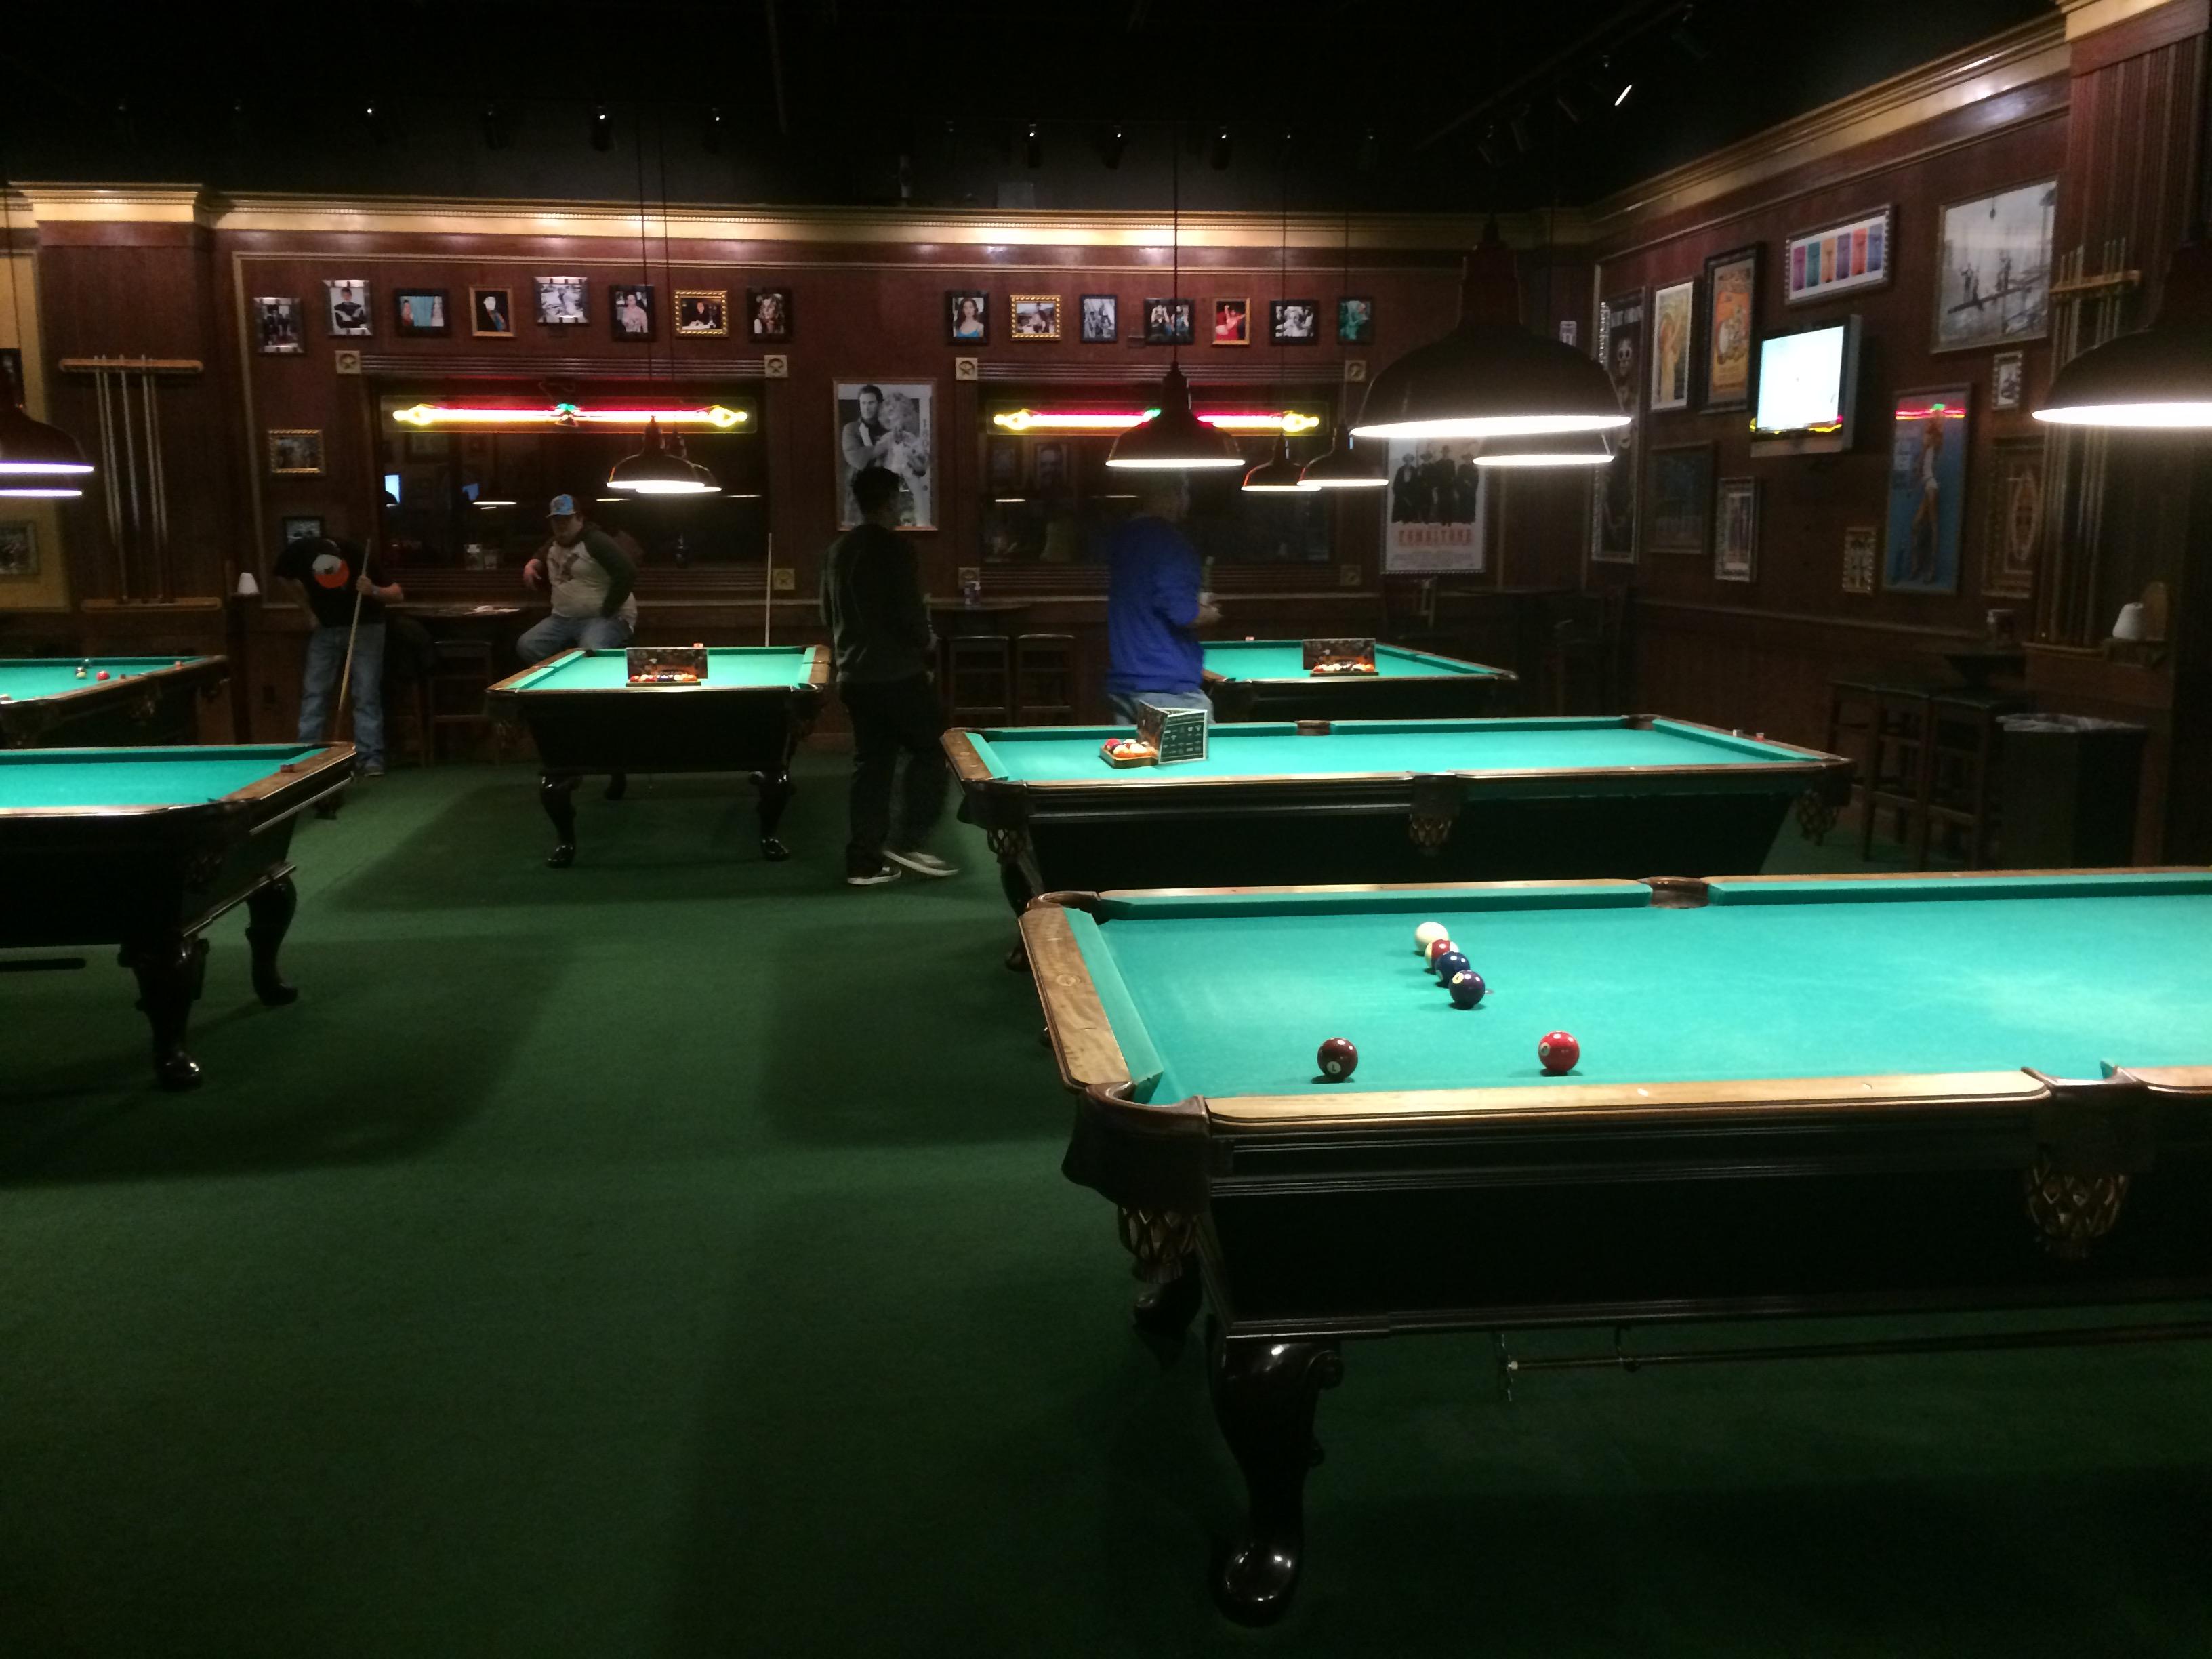 Fast Eddie's Billiards